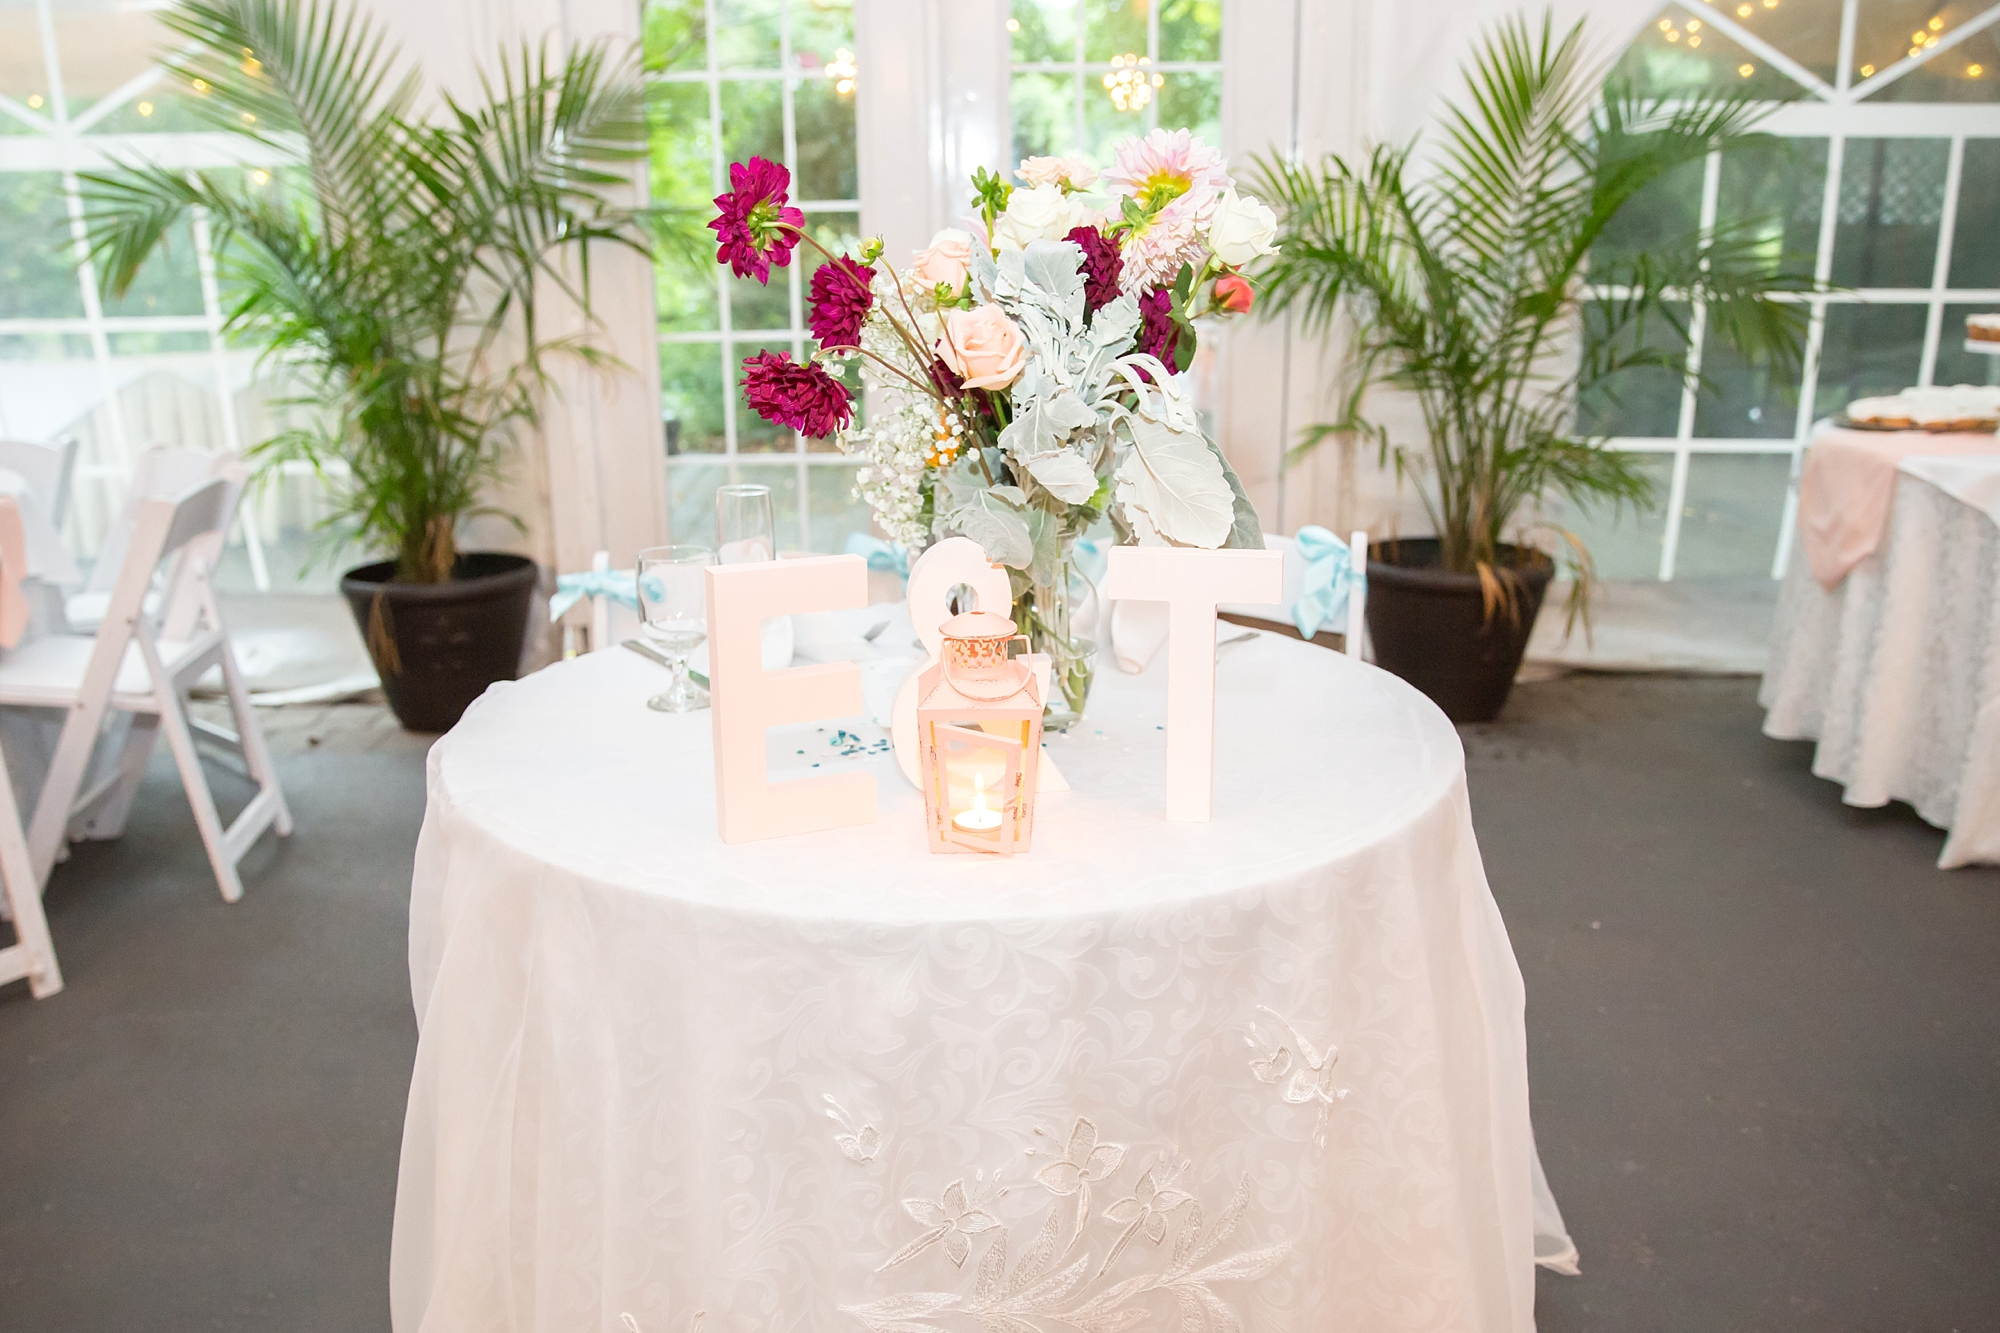 Russell 6-Reception-666_anna grace photography baltimore maryland wedding photographer elkridge furnace inn wedding photo.jpg